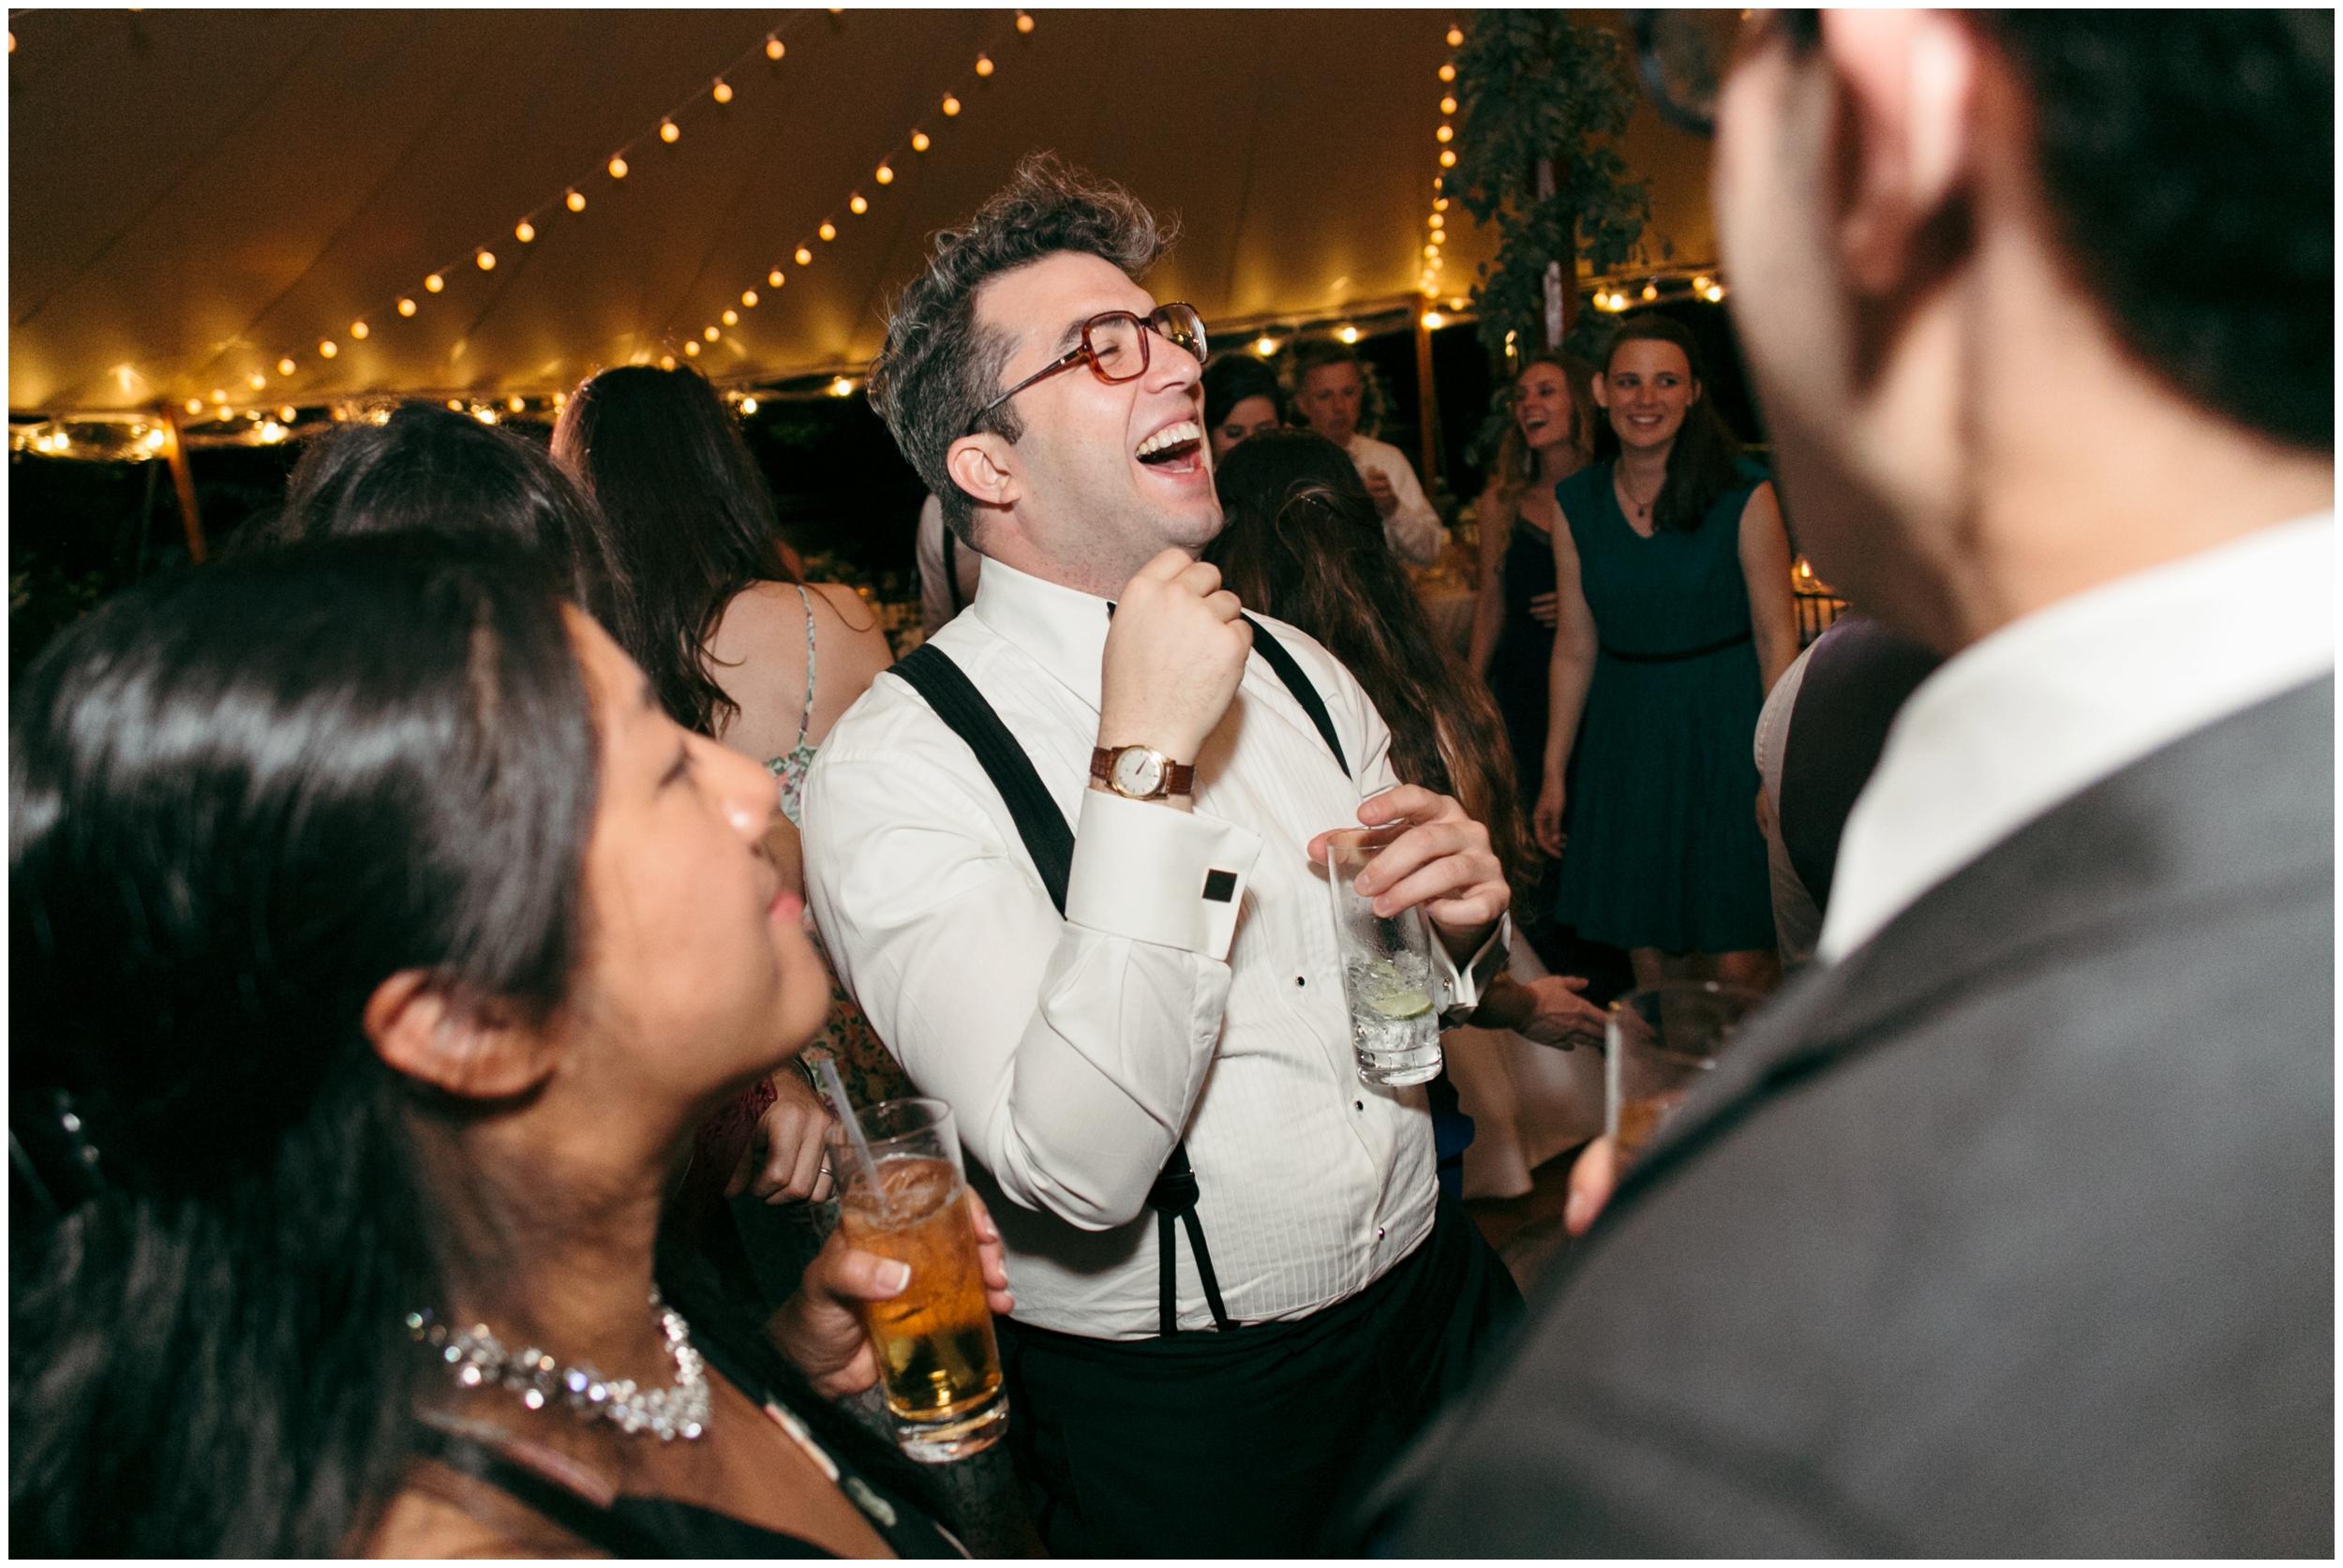 Willowdale-Estate-Wedding-Bailey-Q-Photo-Boston-Wedding-Photographer-108.JPG